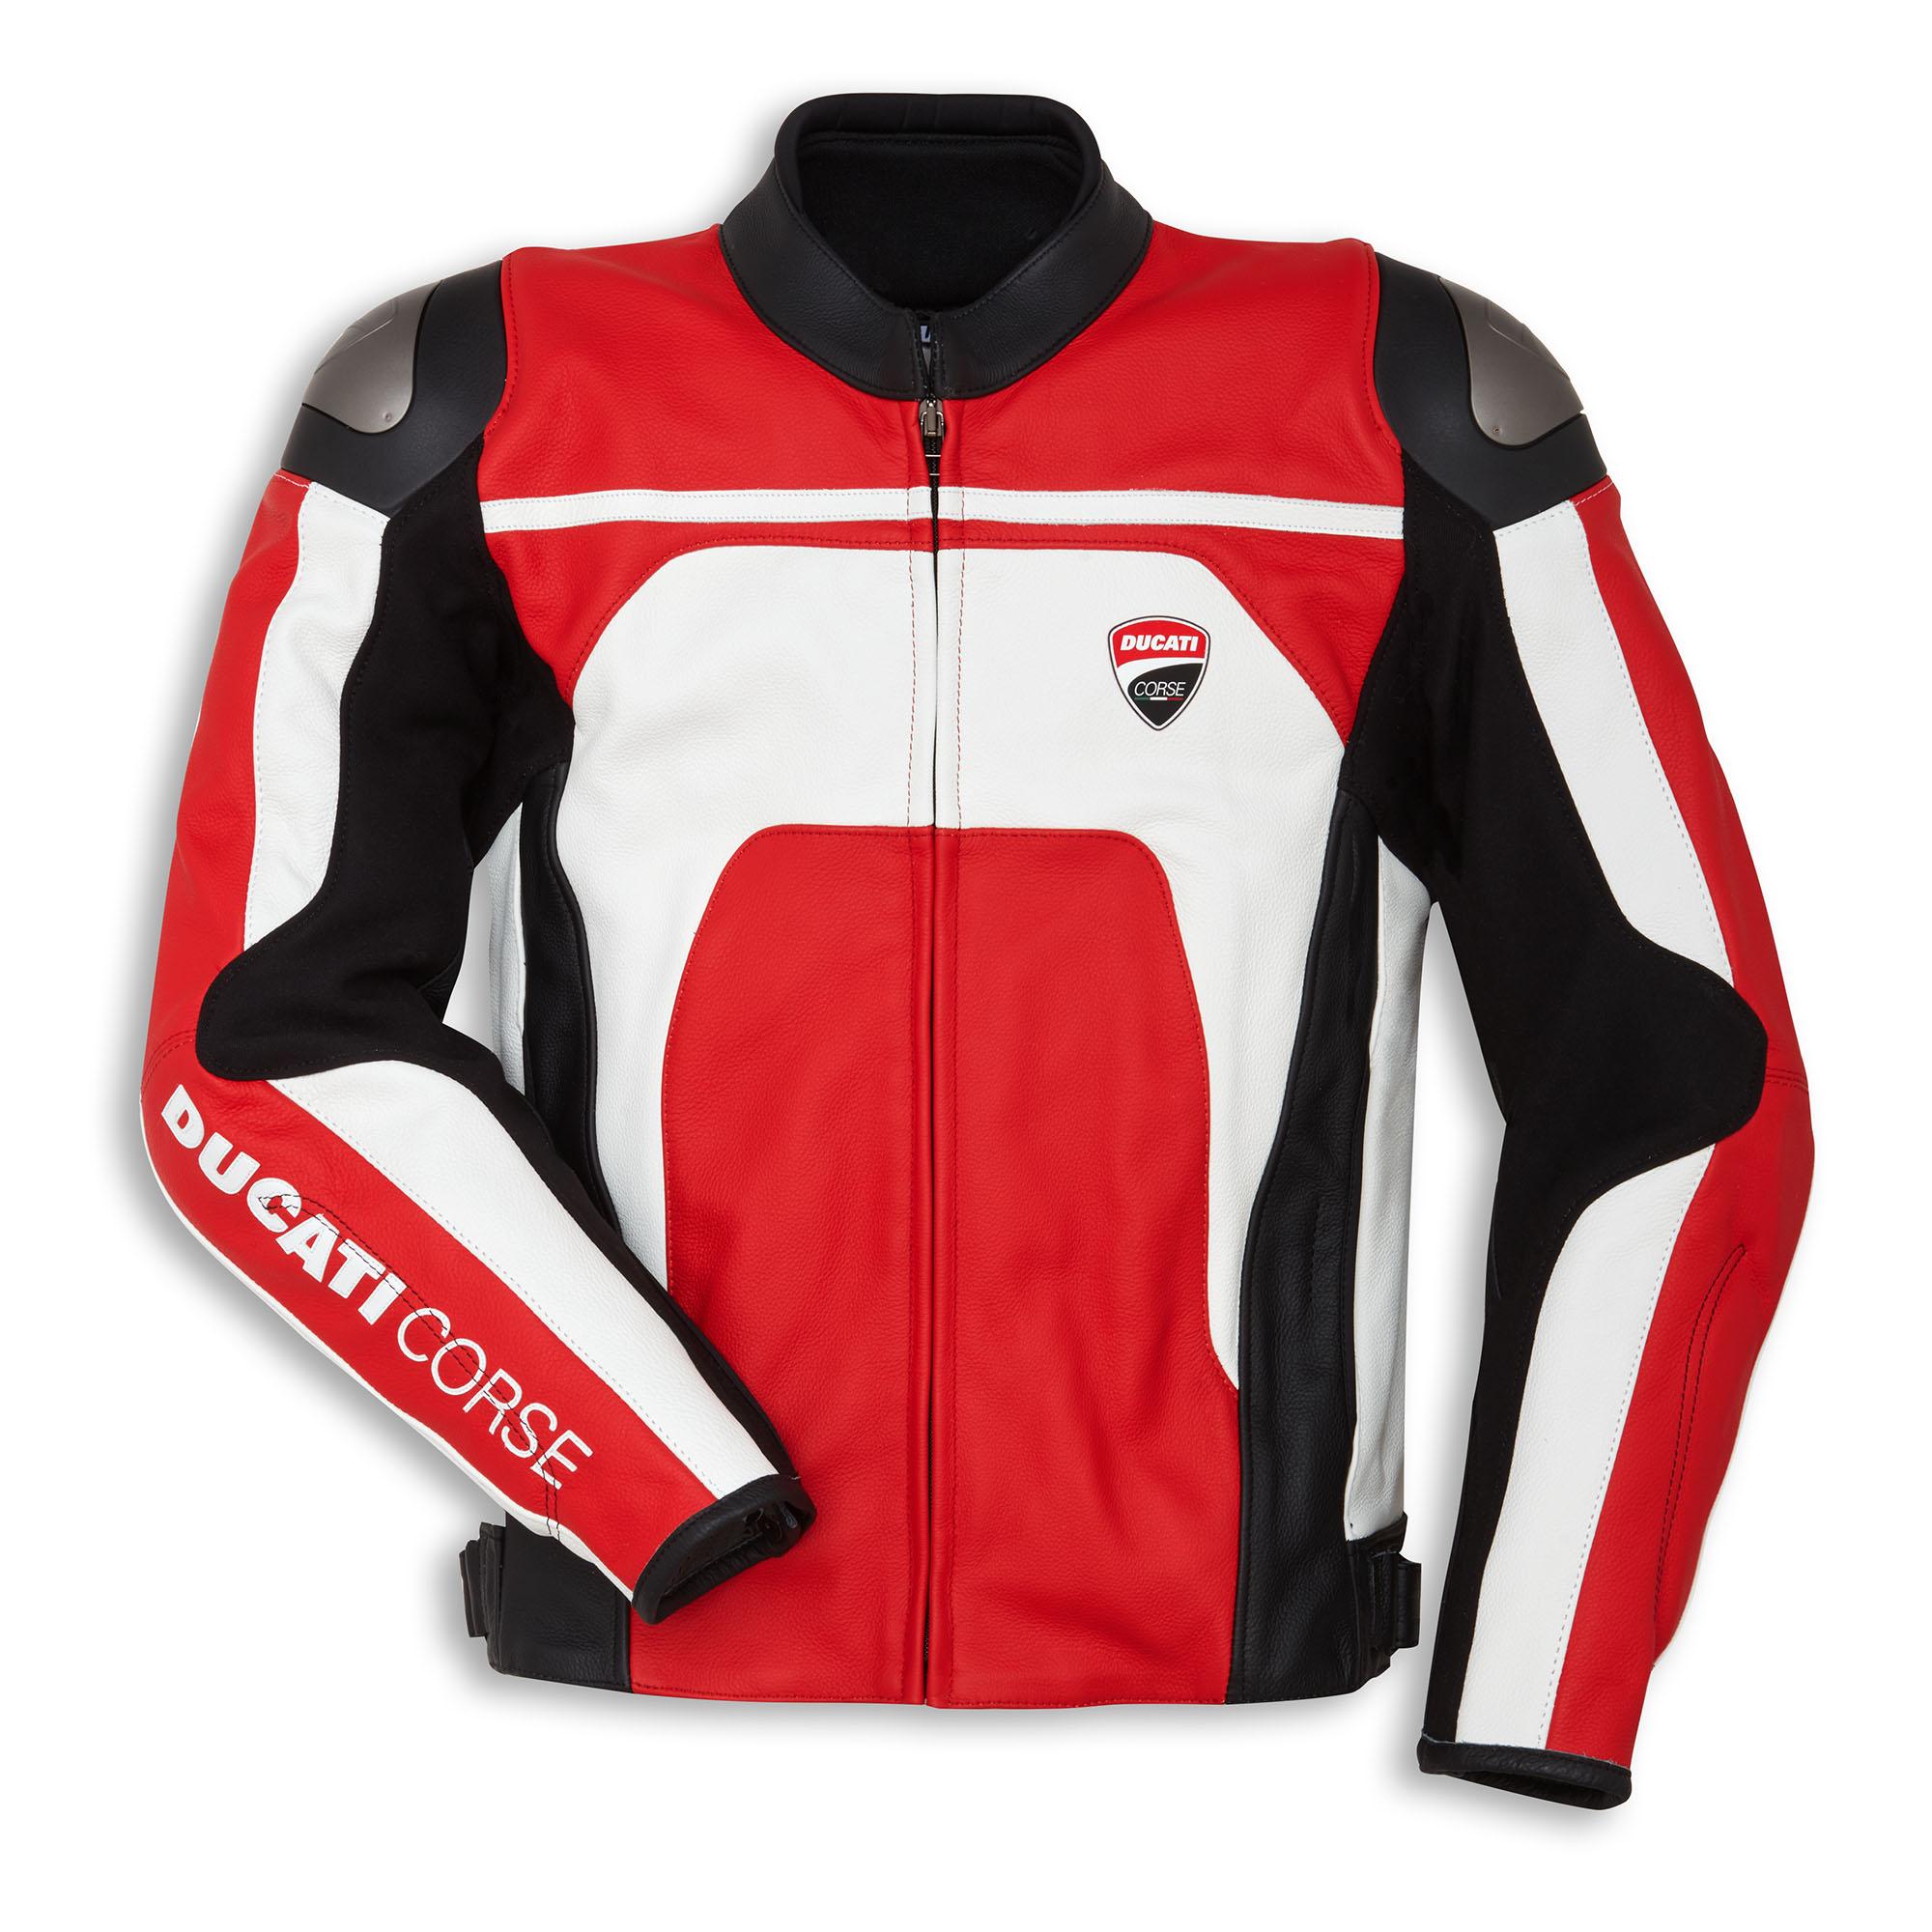 Ducati Corse C4 Leather jacket 981045248